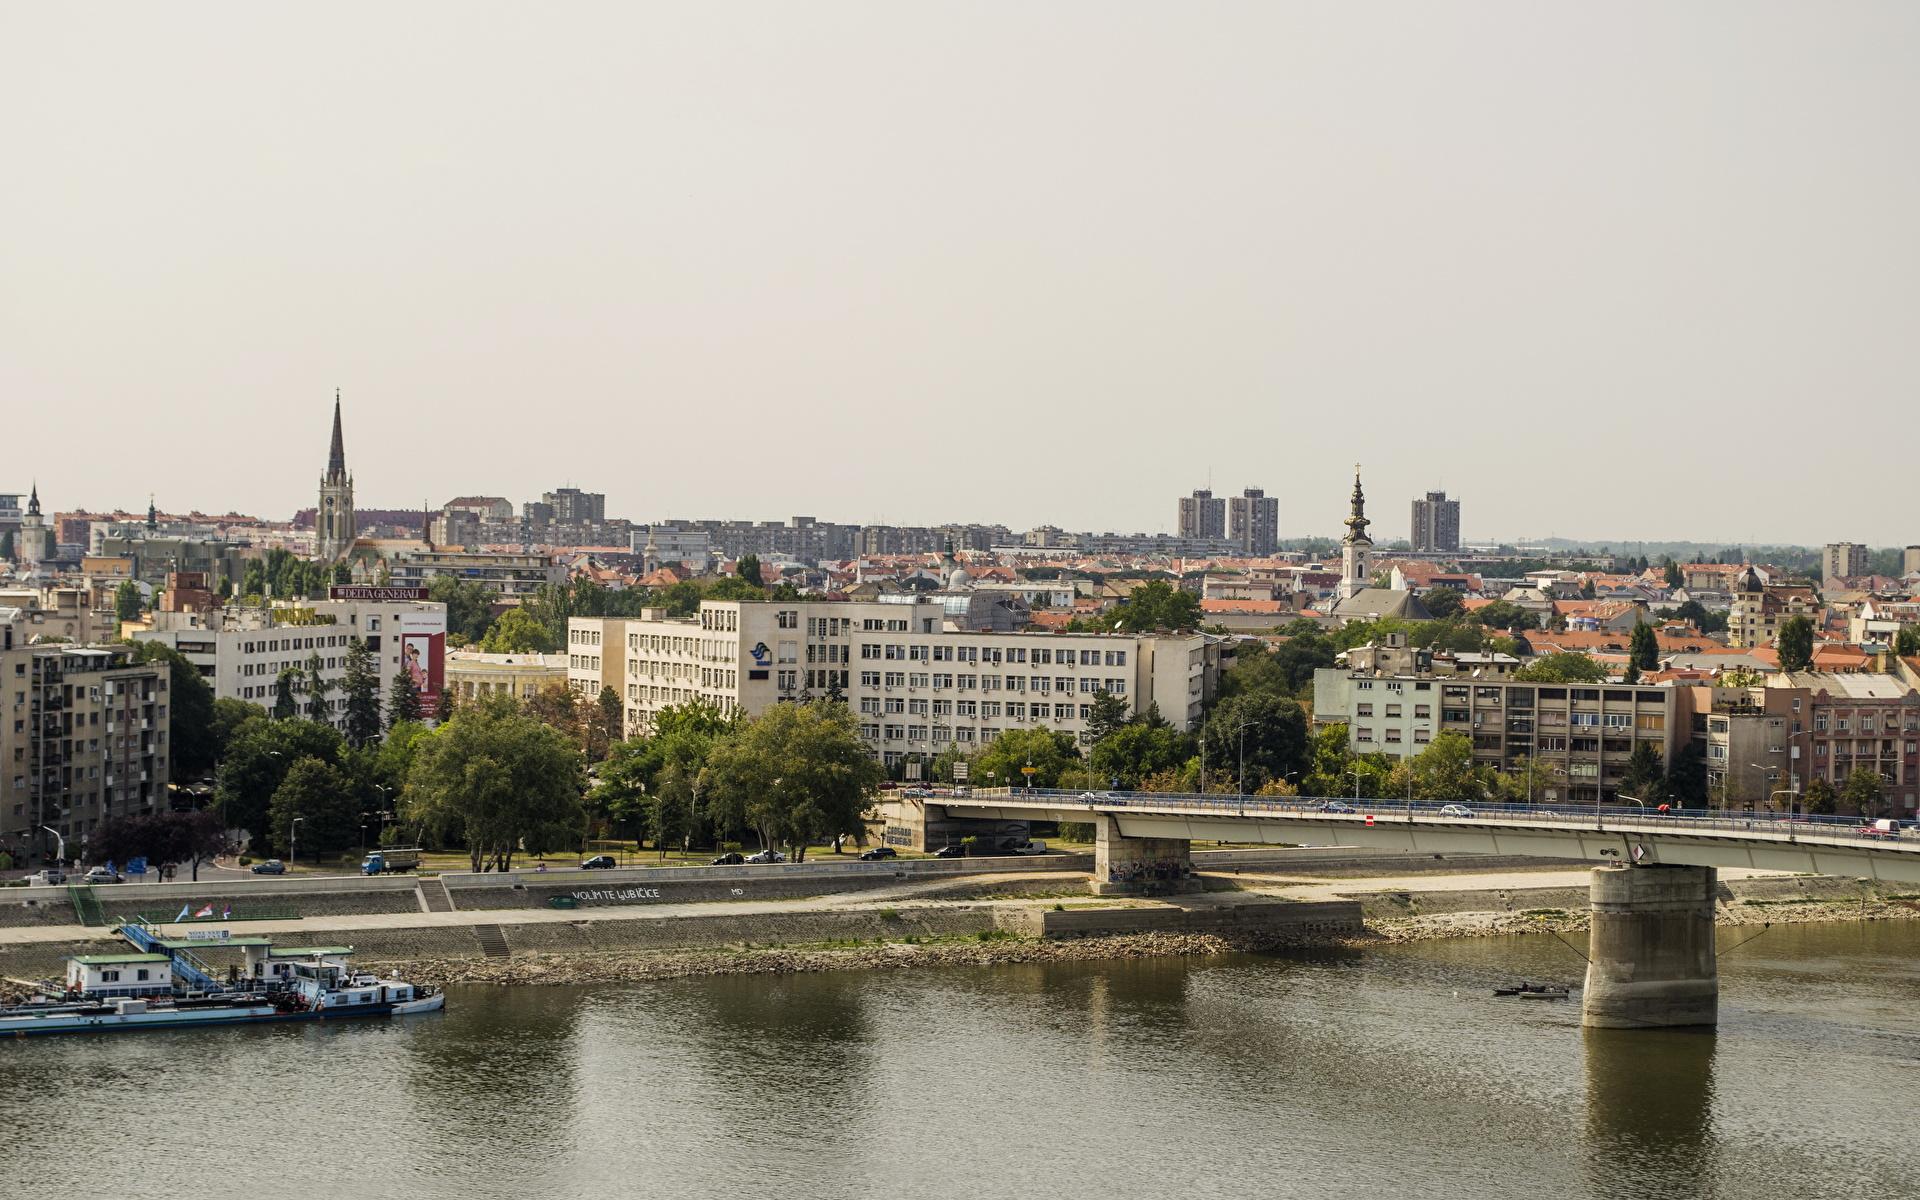 Pictures Serbia Novi Sad bridge Cities Building 1920x1200 Bridges Houses